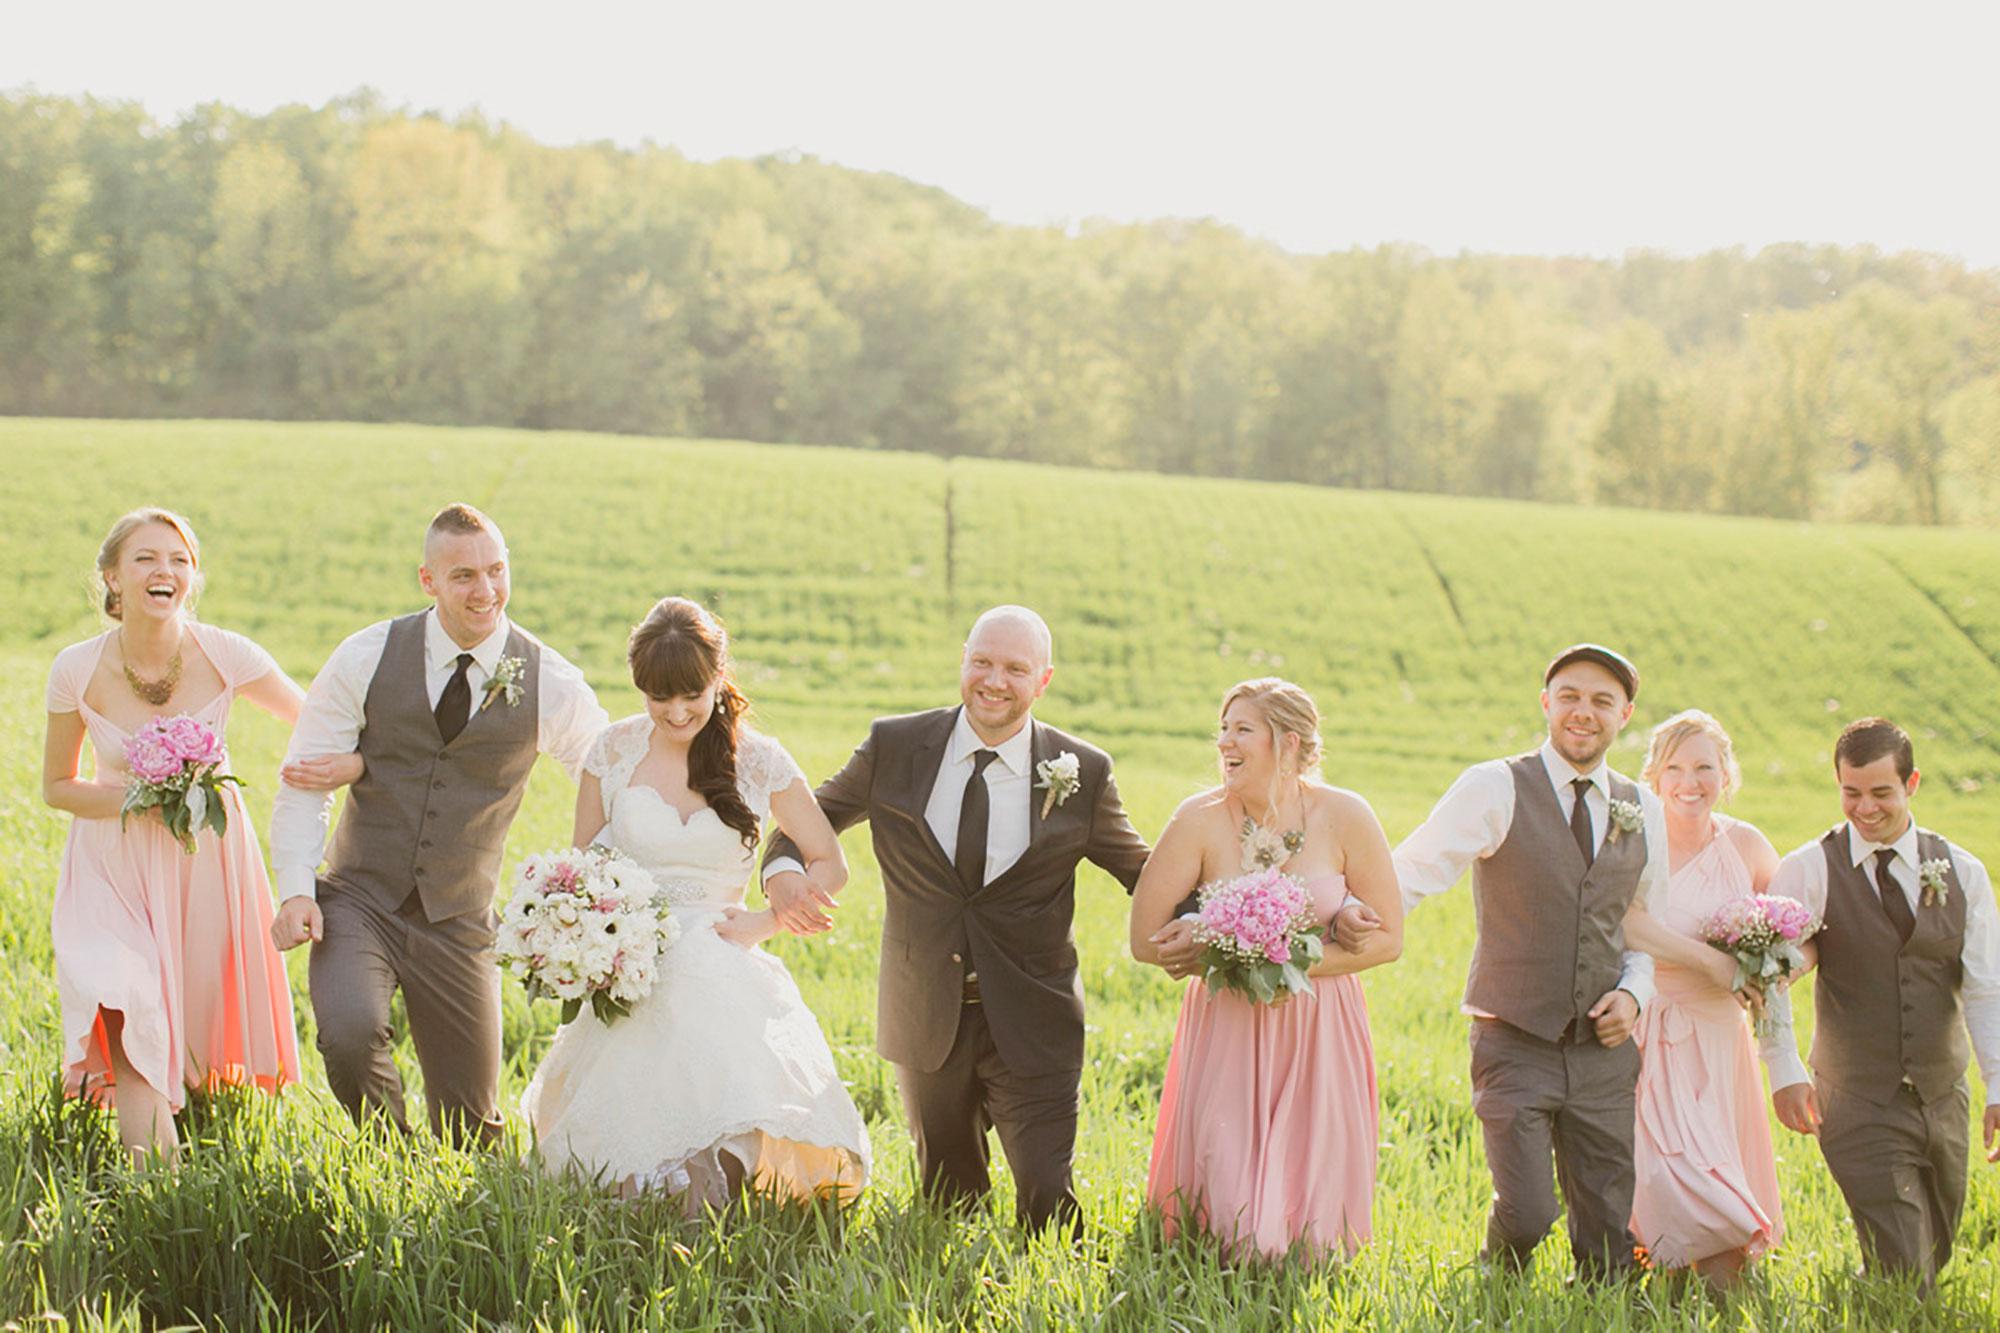 Balls-Falls-Vineyard-Bride-Photo-By-Elizabeth-in-Love-024.jpg